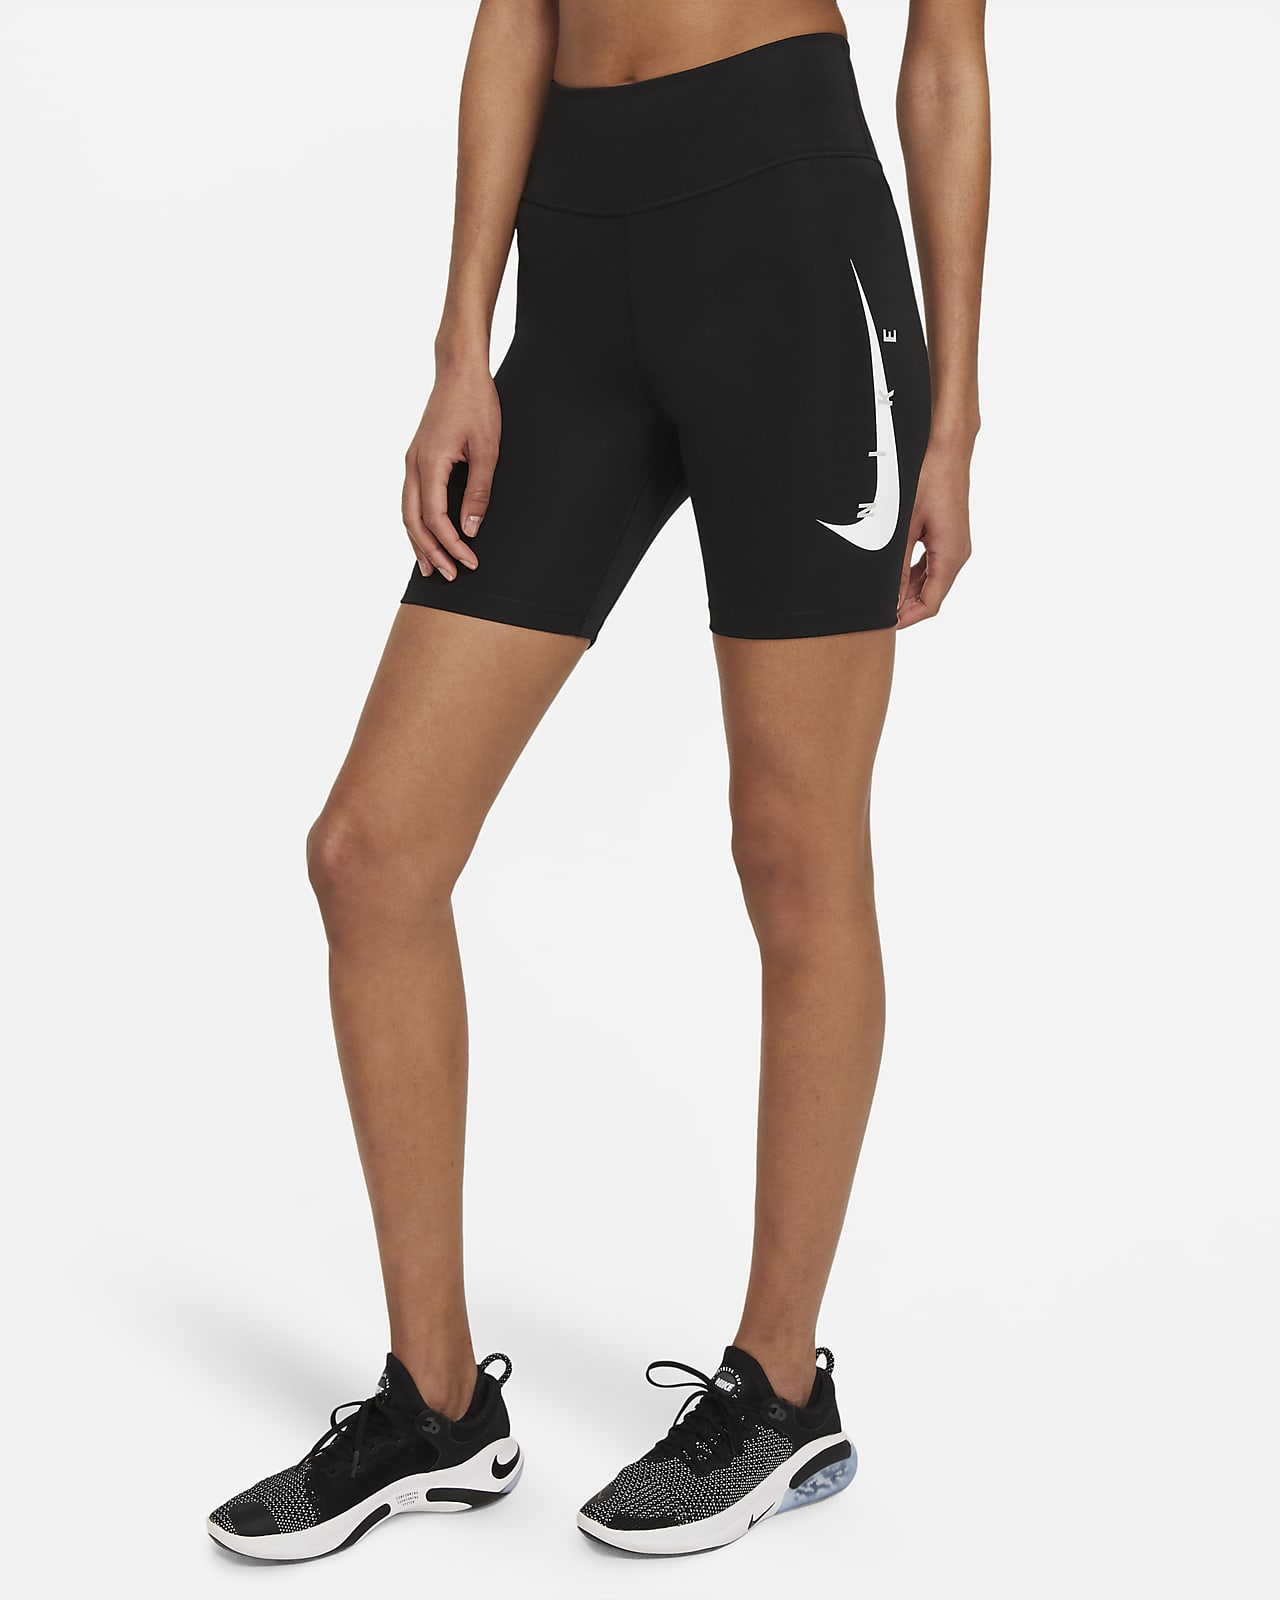 Nike Swoosh Run Hardlooptights voor dames (18 cm)